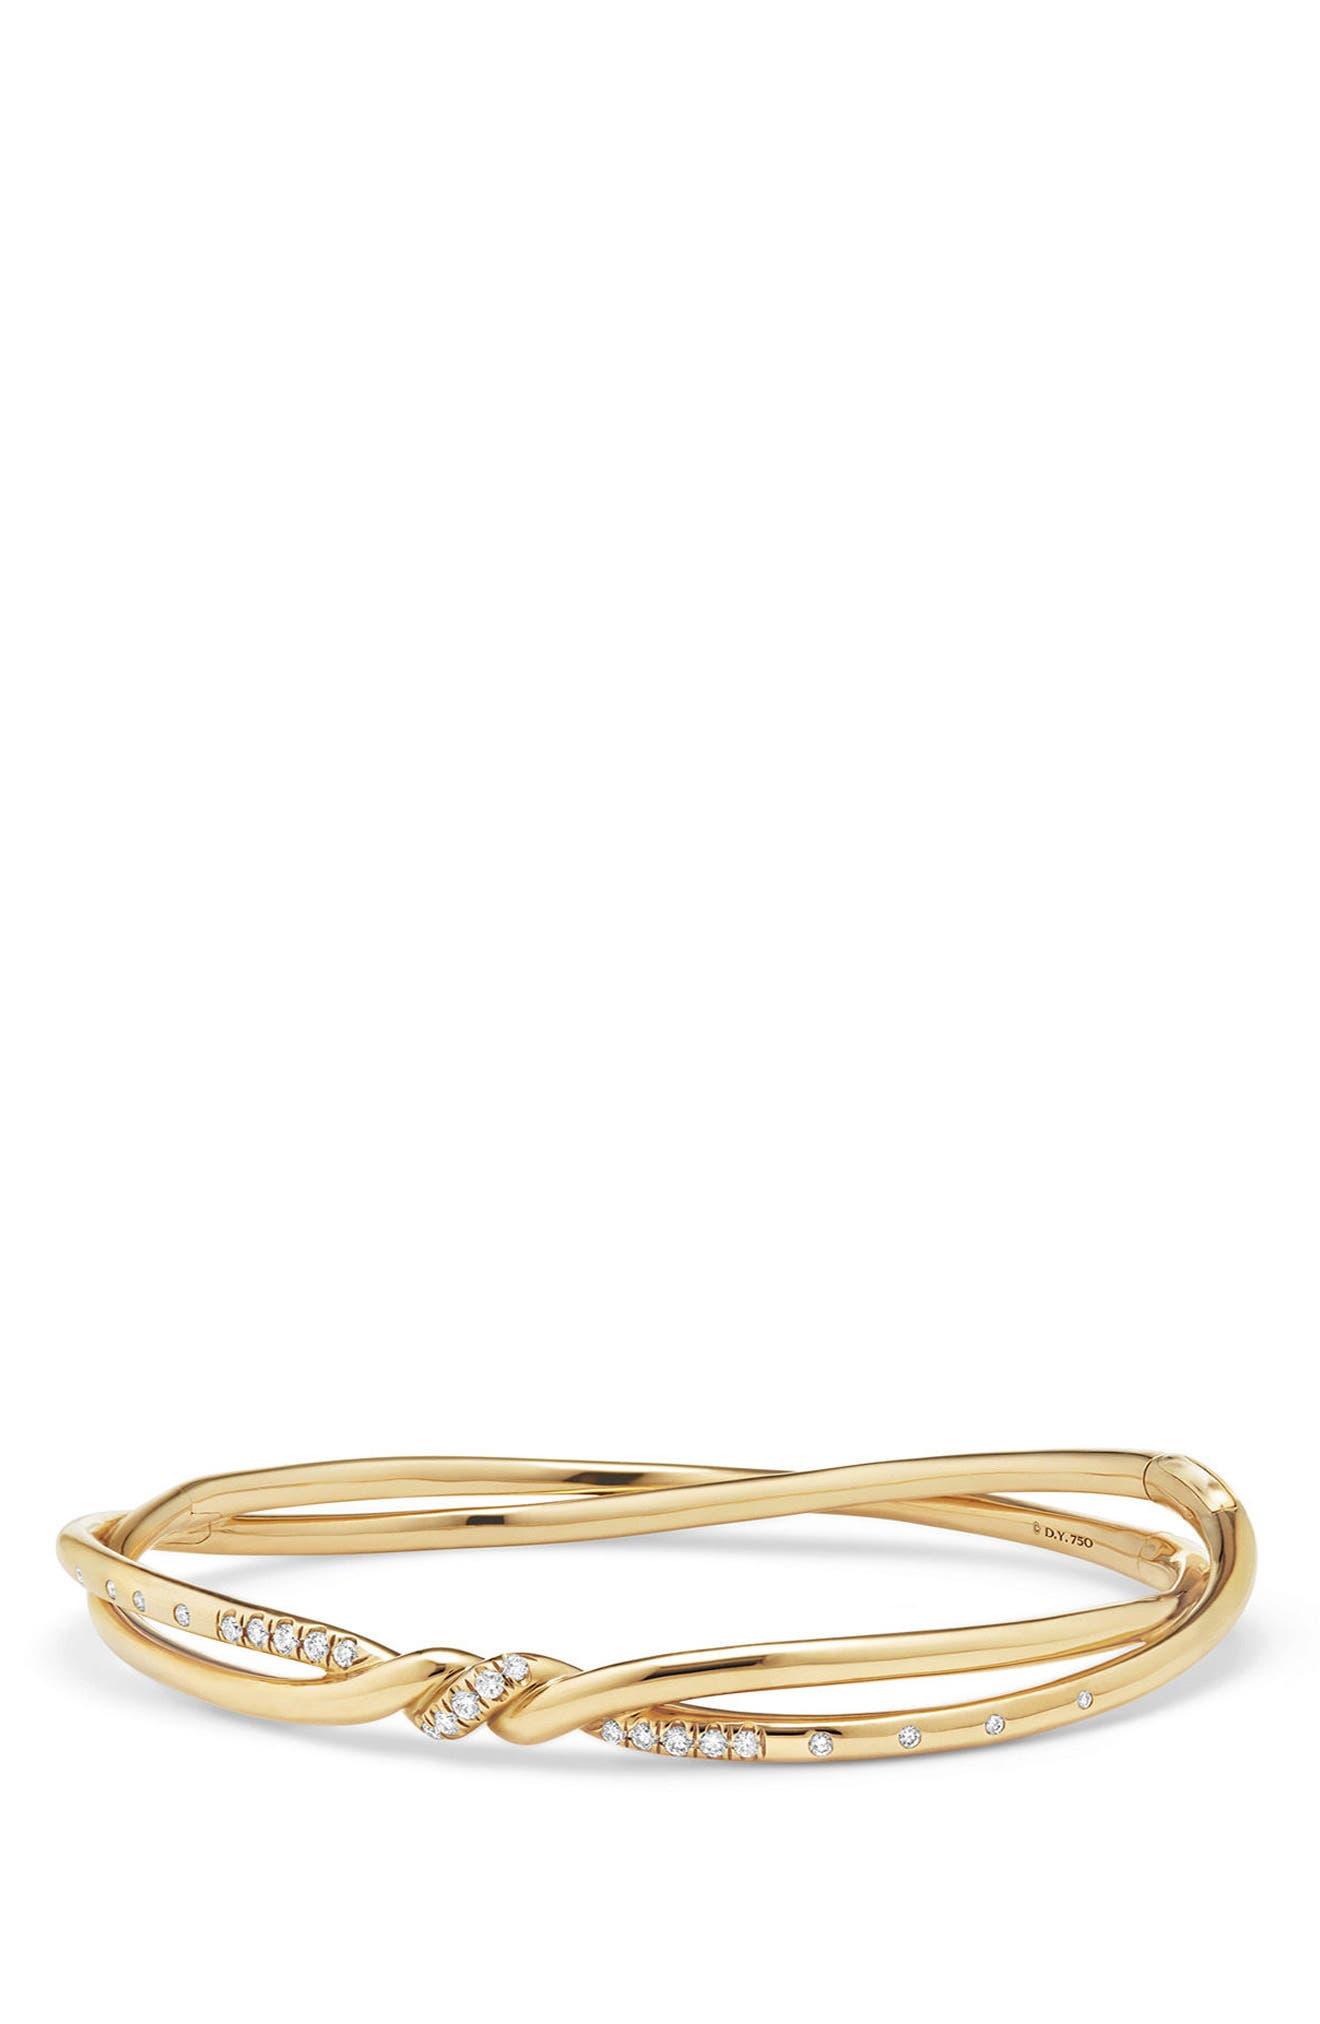 Continuance Center Twist 18K Gold Bracelet with Diamonds,                         Main,                         color, YELLOW GOLD